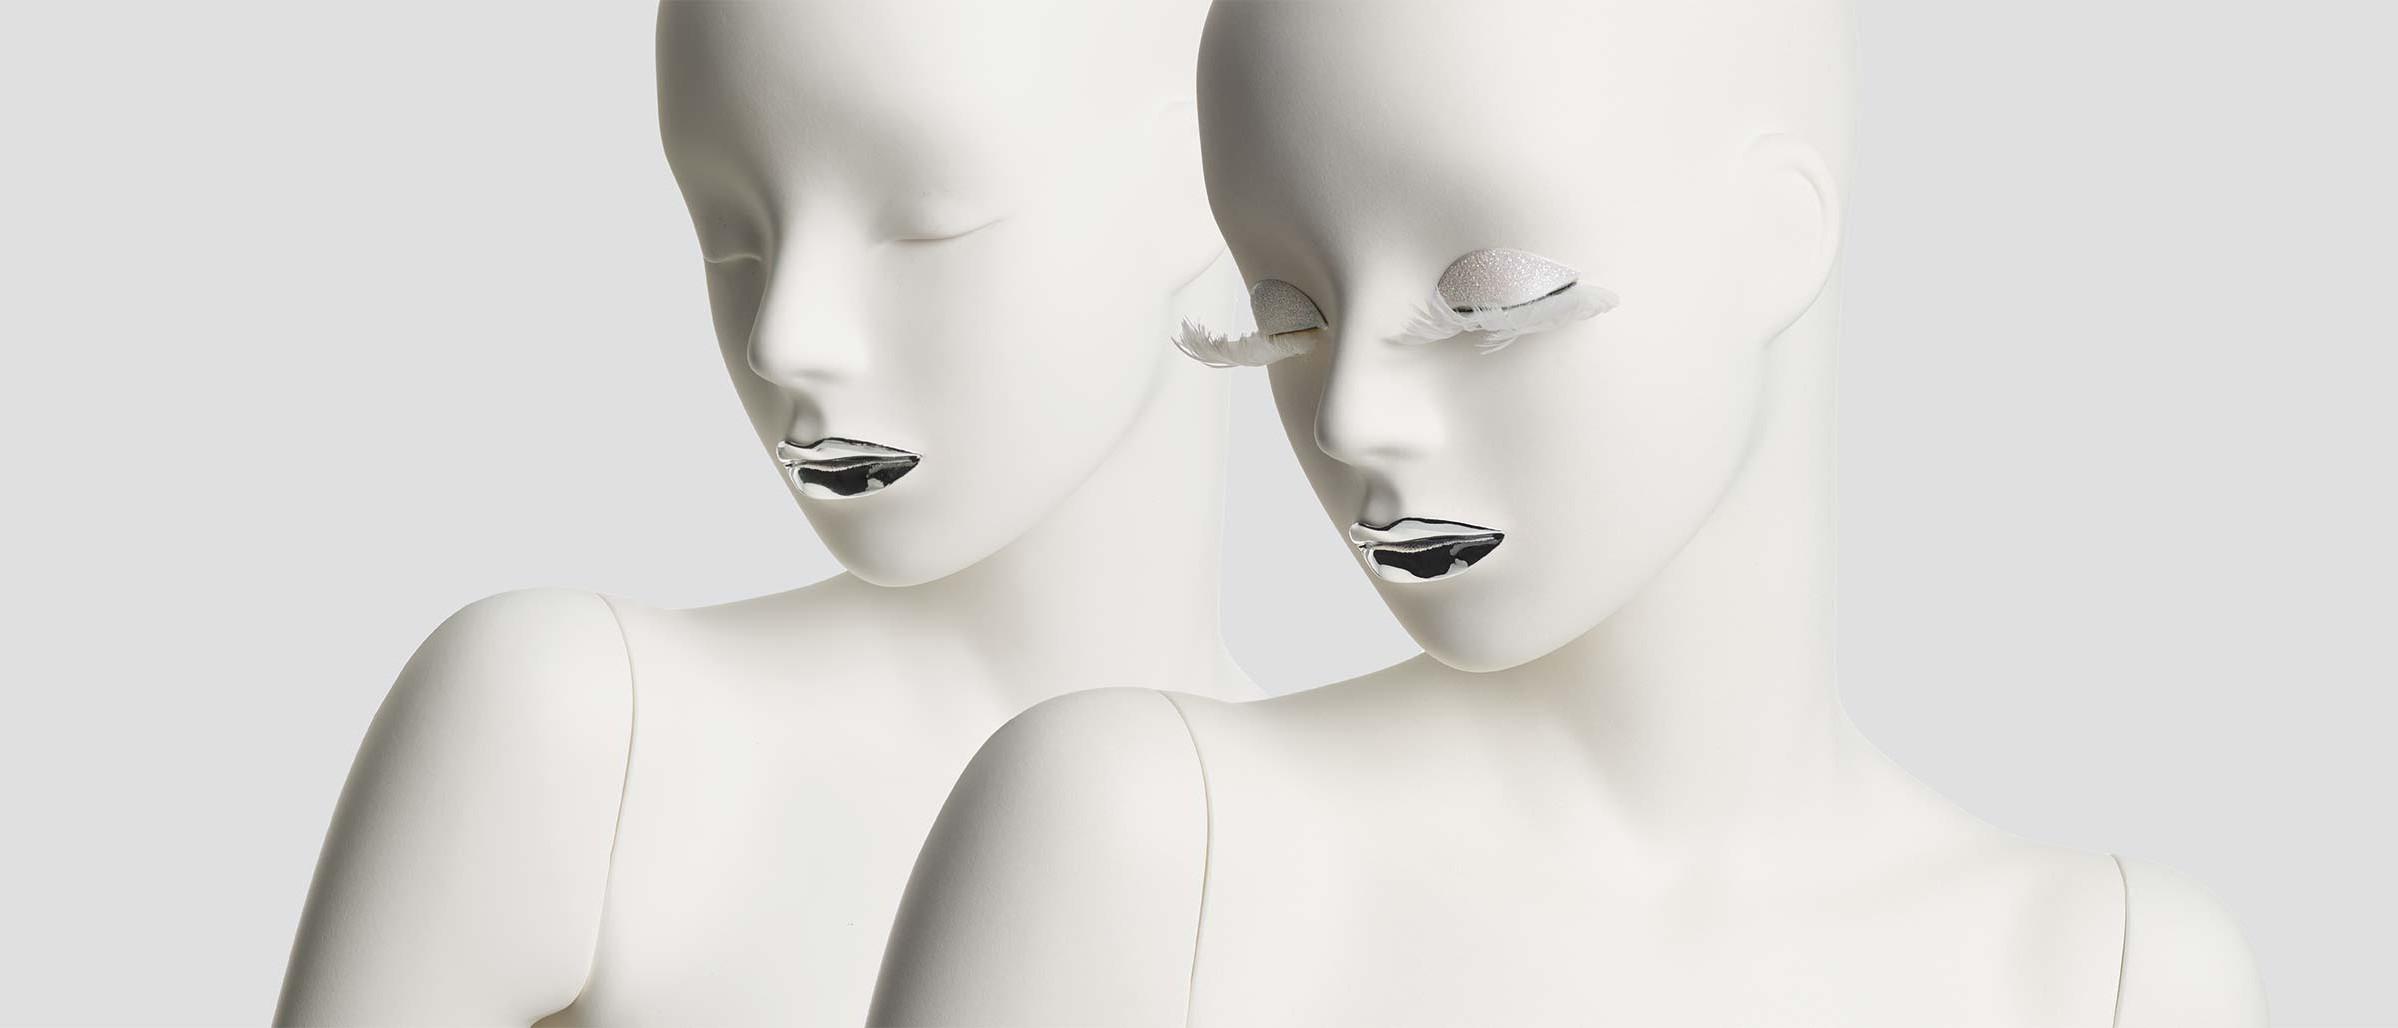 ACB Displays Mannequins